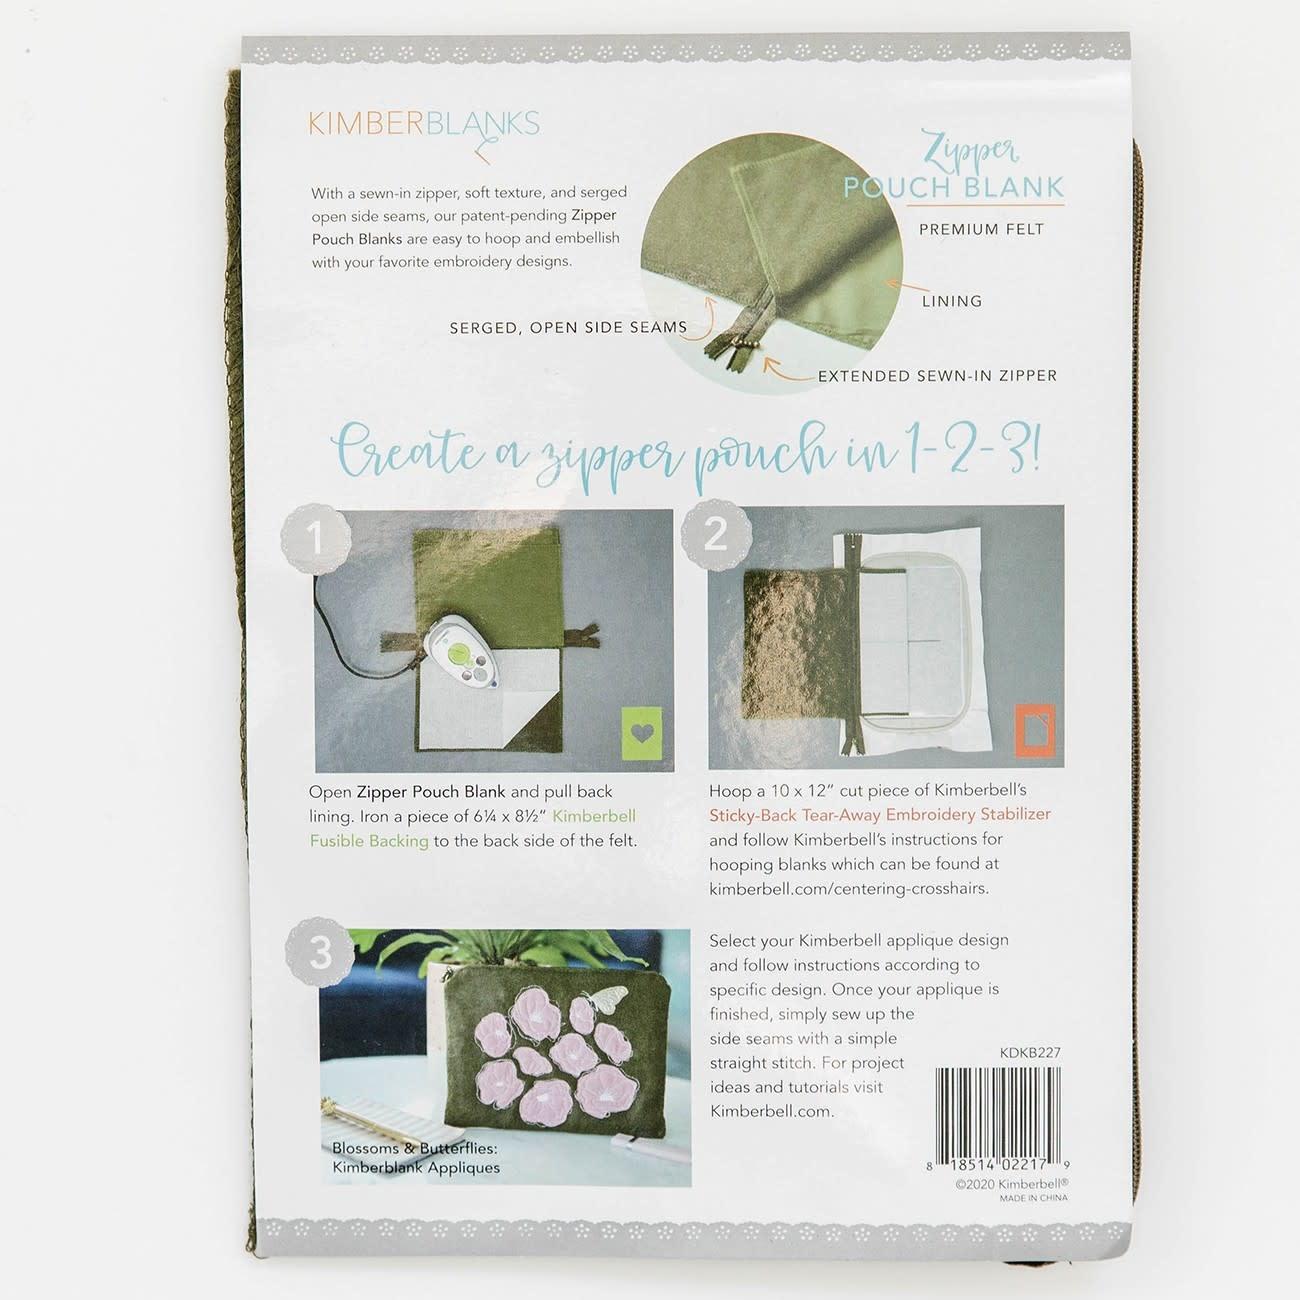 KIMBERBELL DESIGNS Olive Felt Zipper Pouch Blank, Small